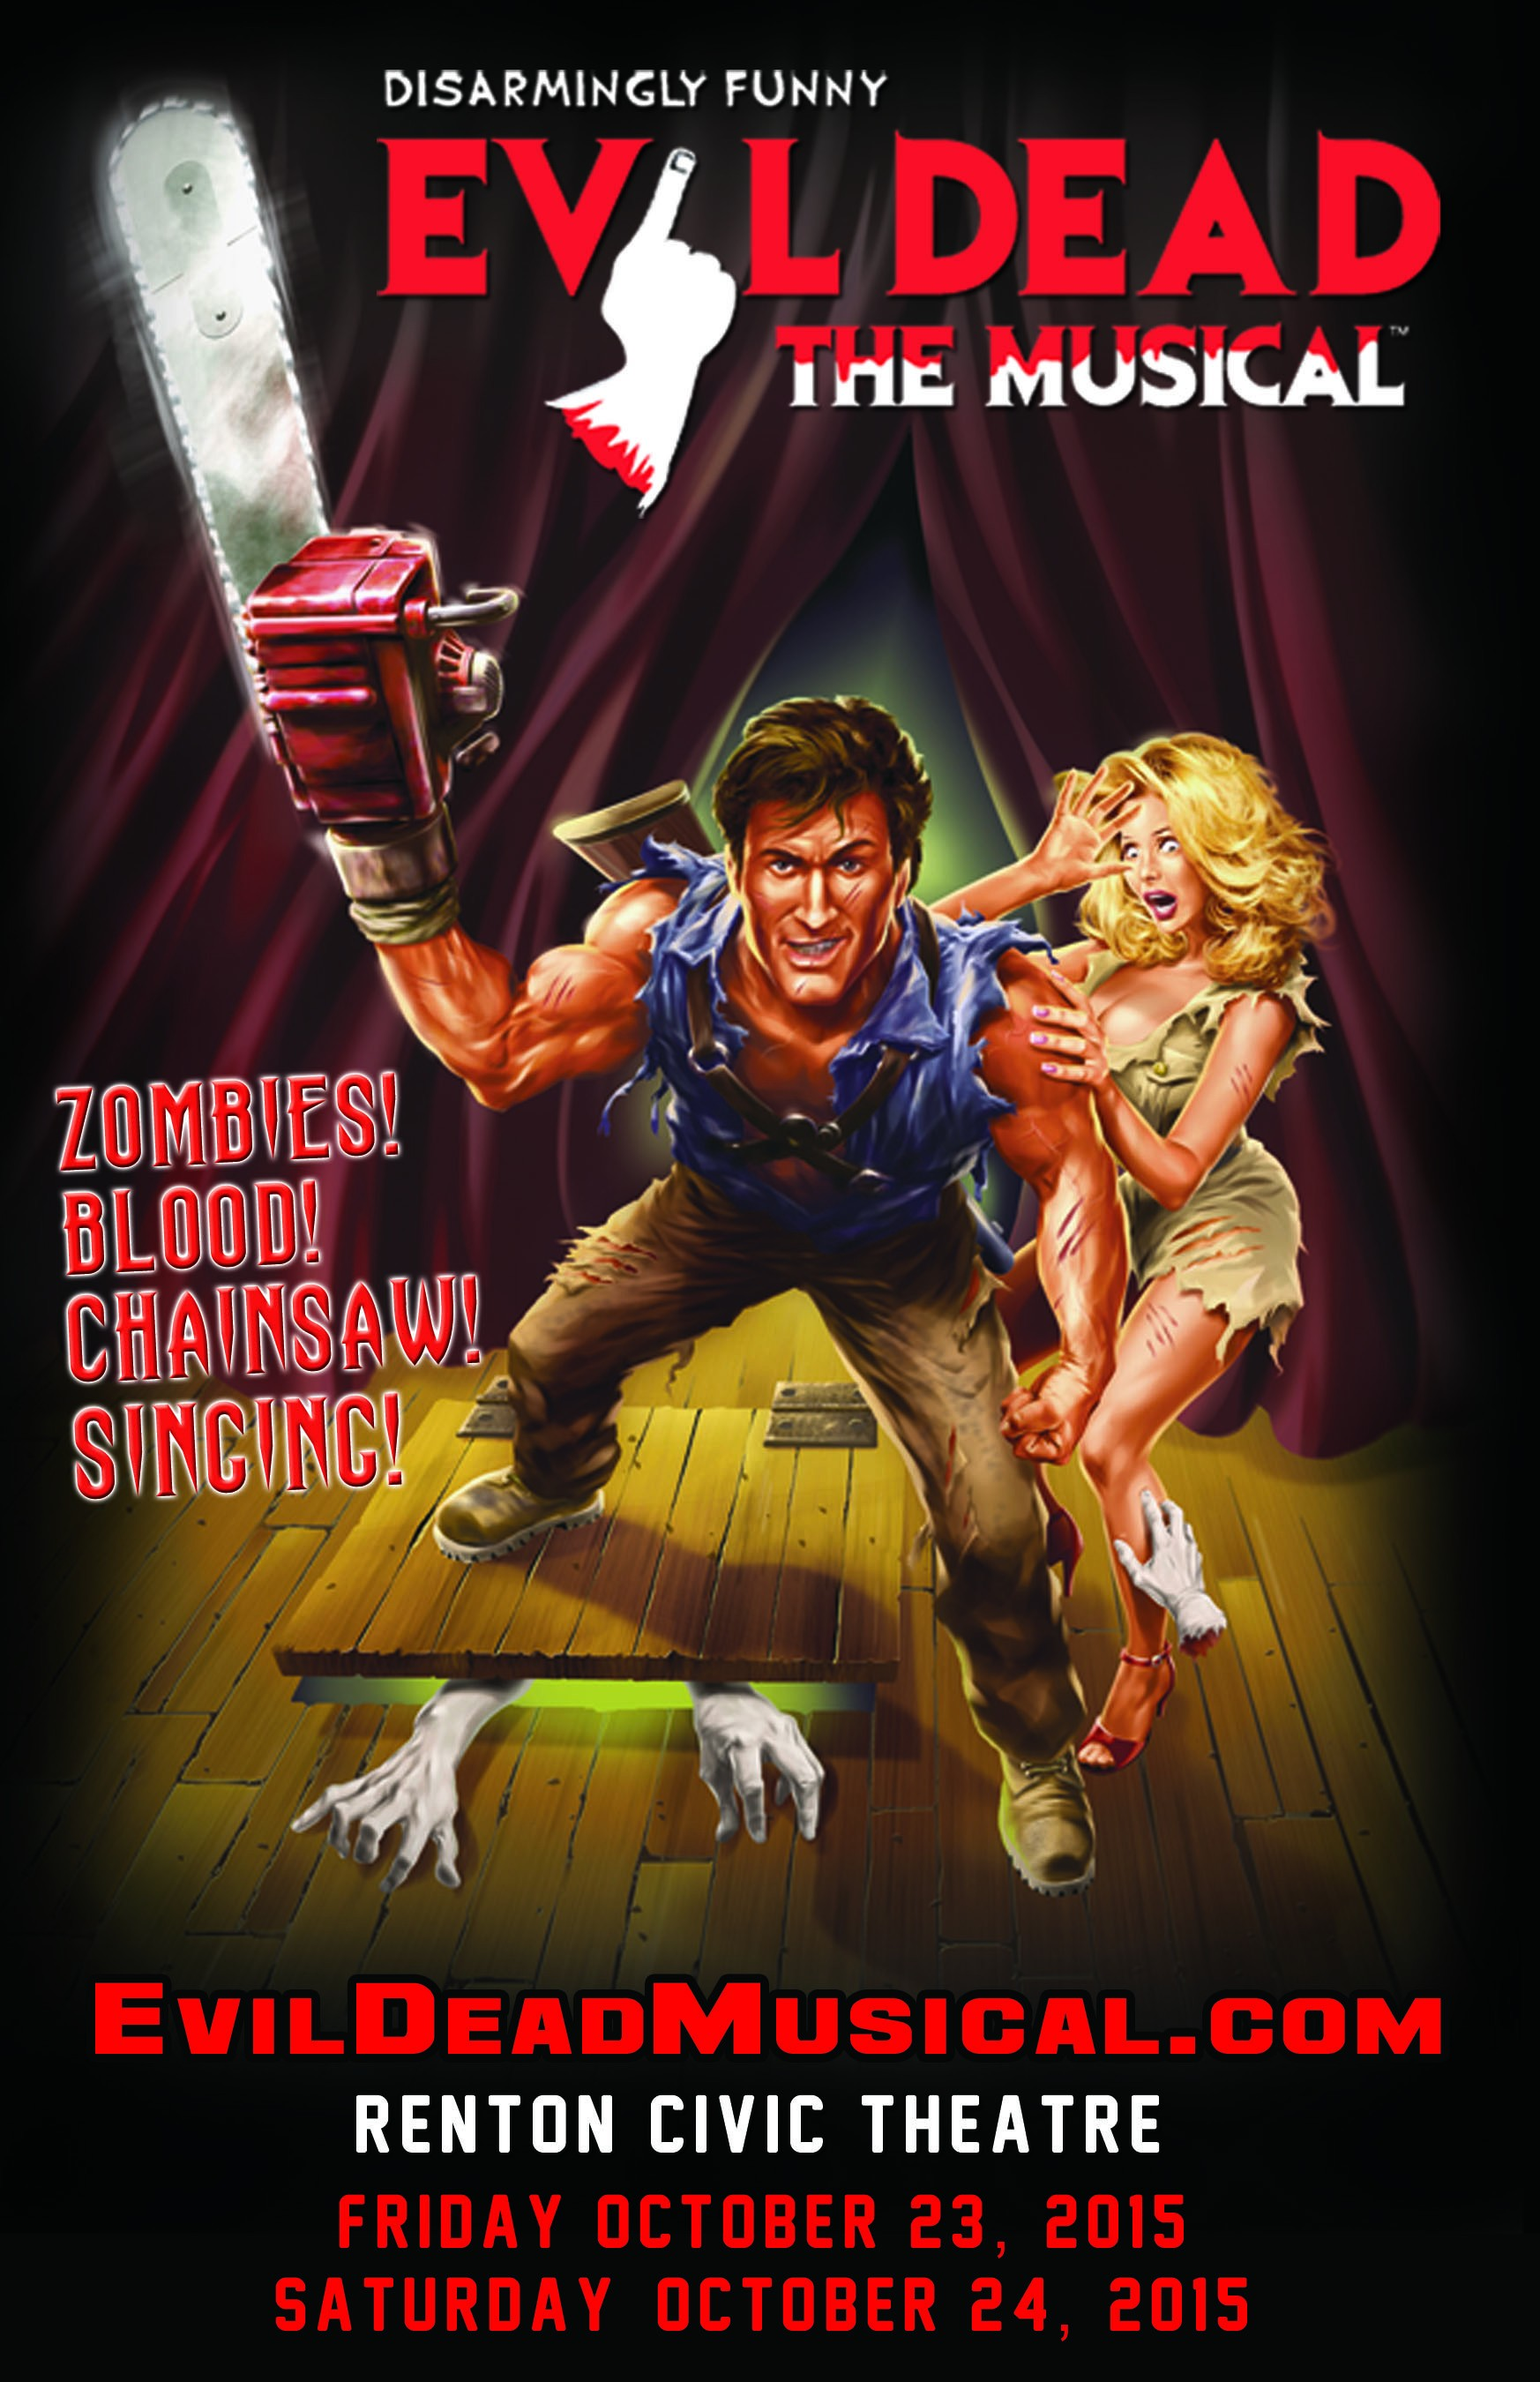 Movie-musical Evil (2019) 33